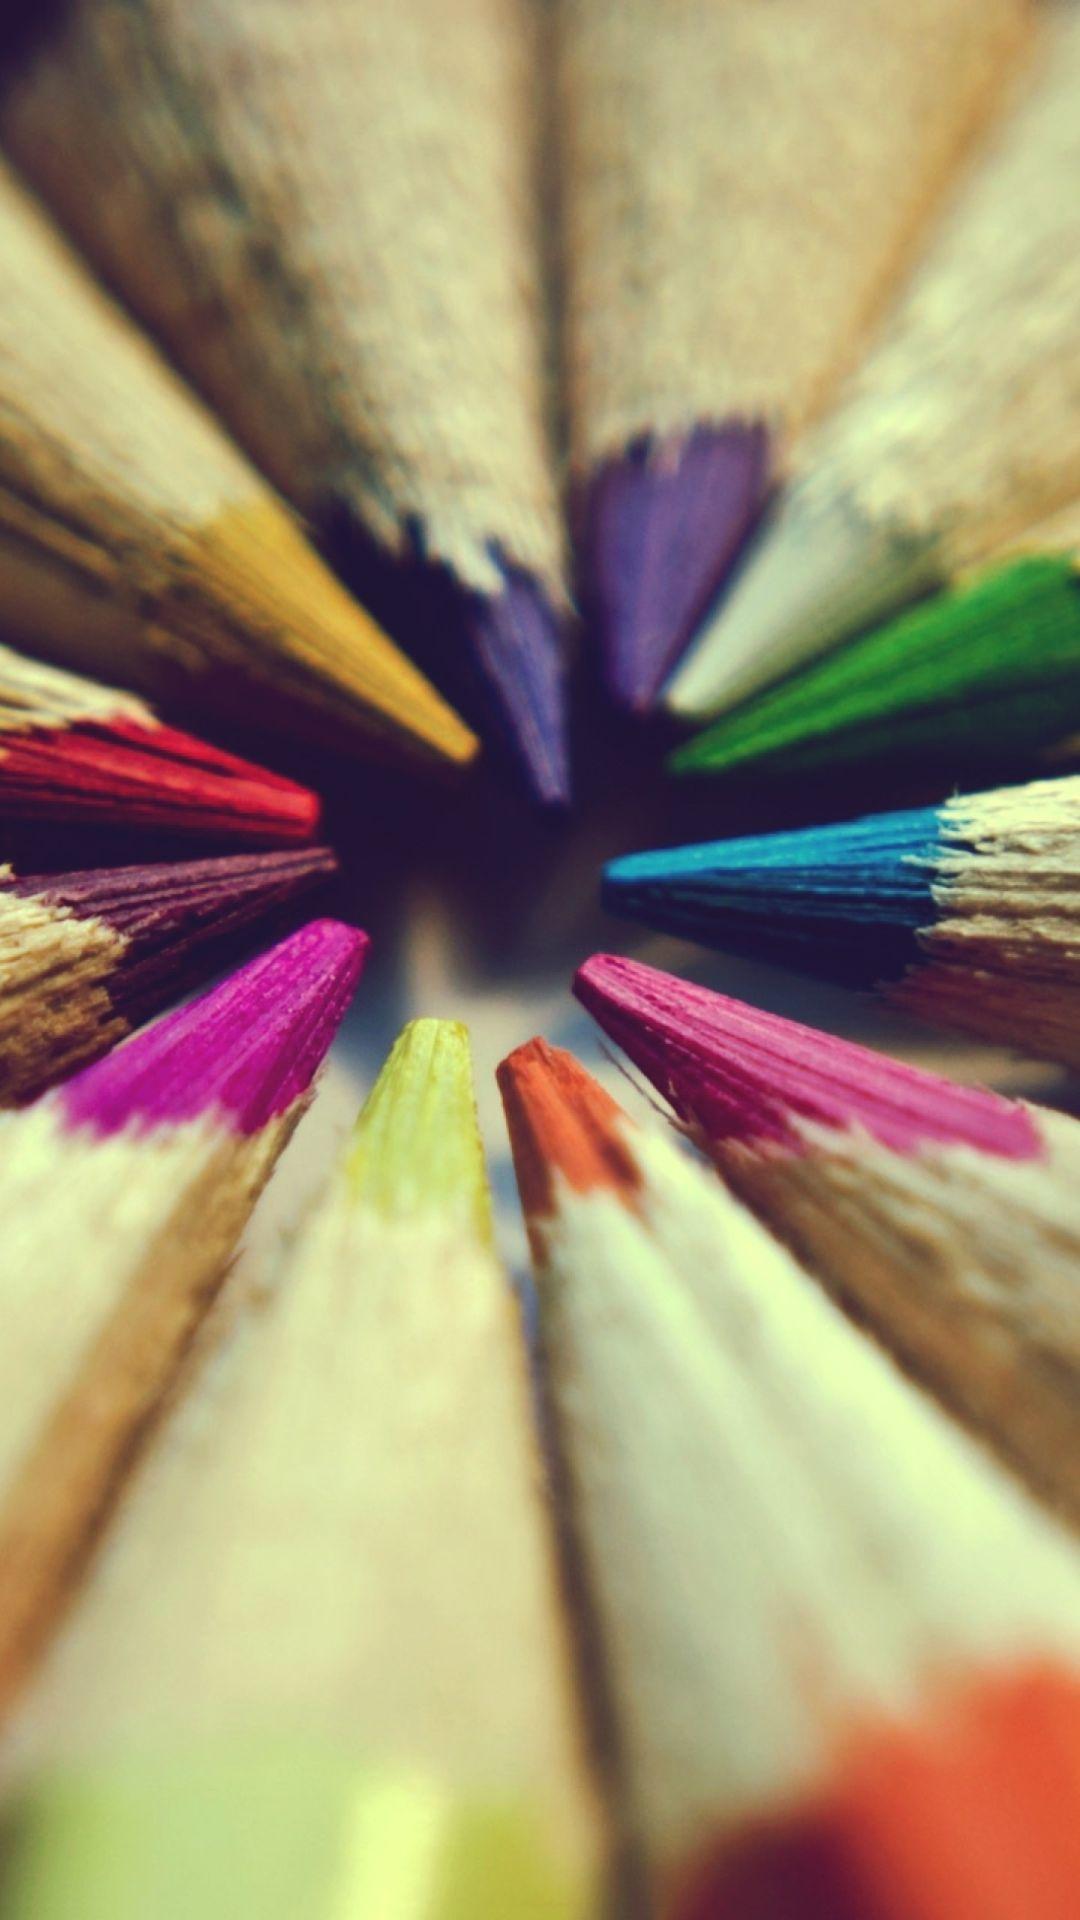 Bright Colors Of Pencils Wallpaper For Nokia Lumia